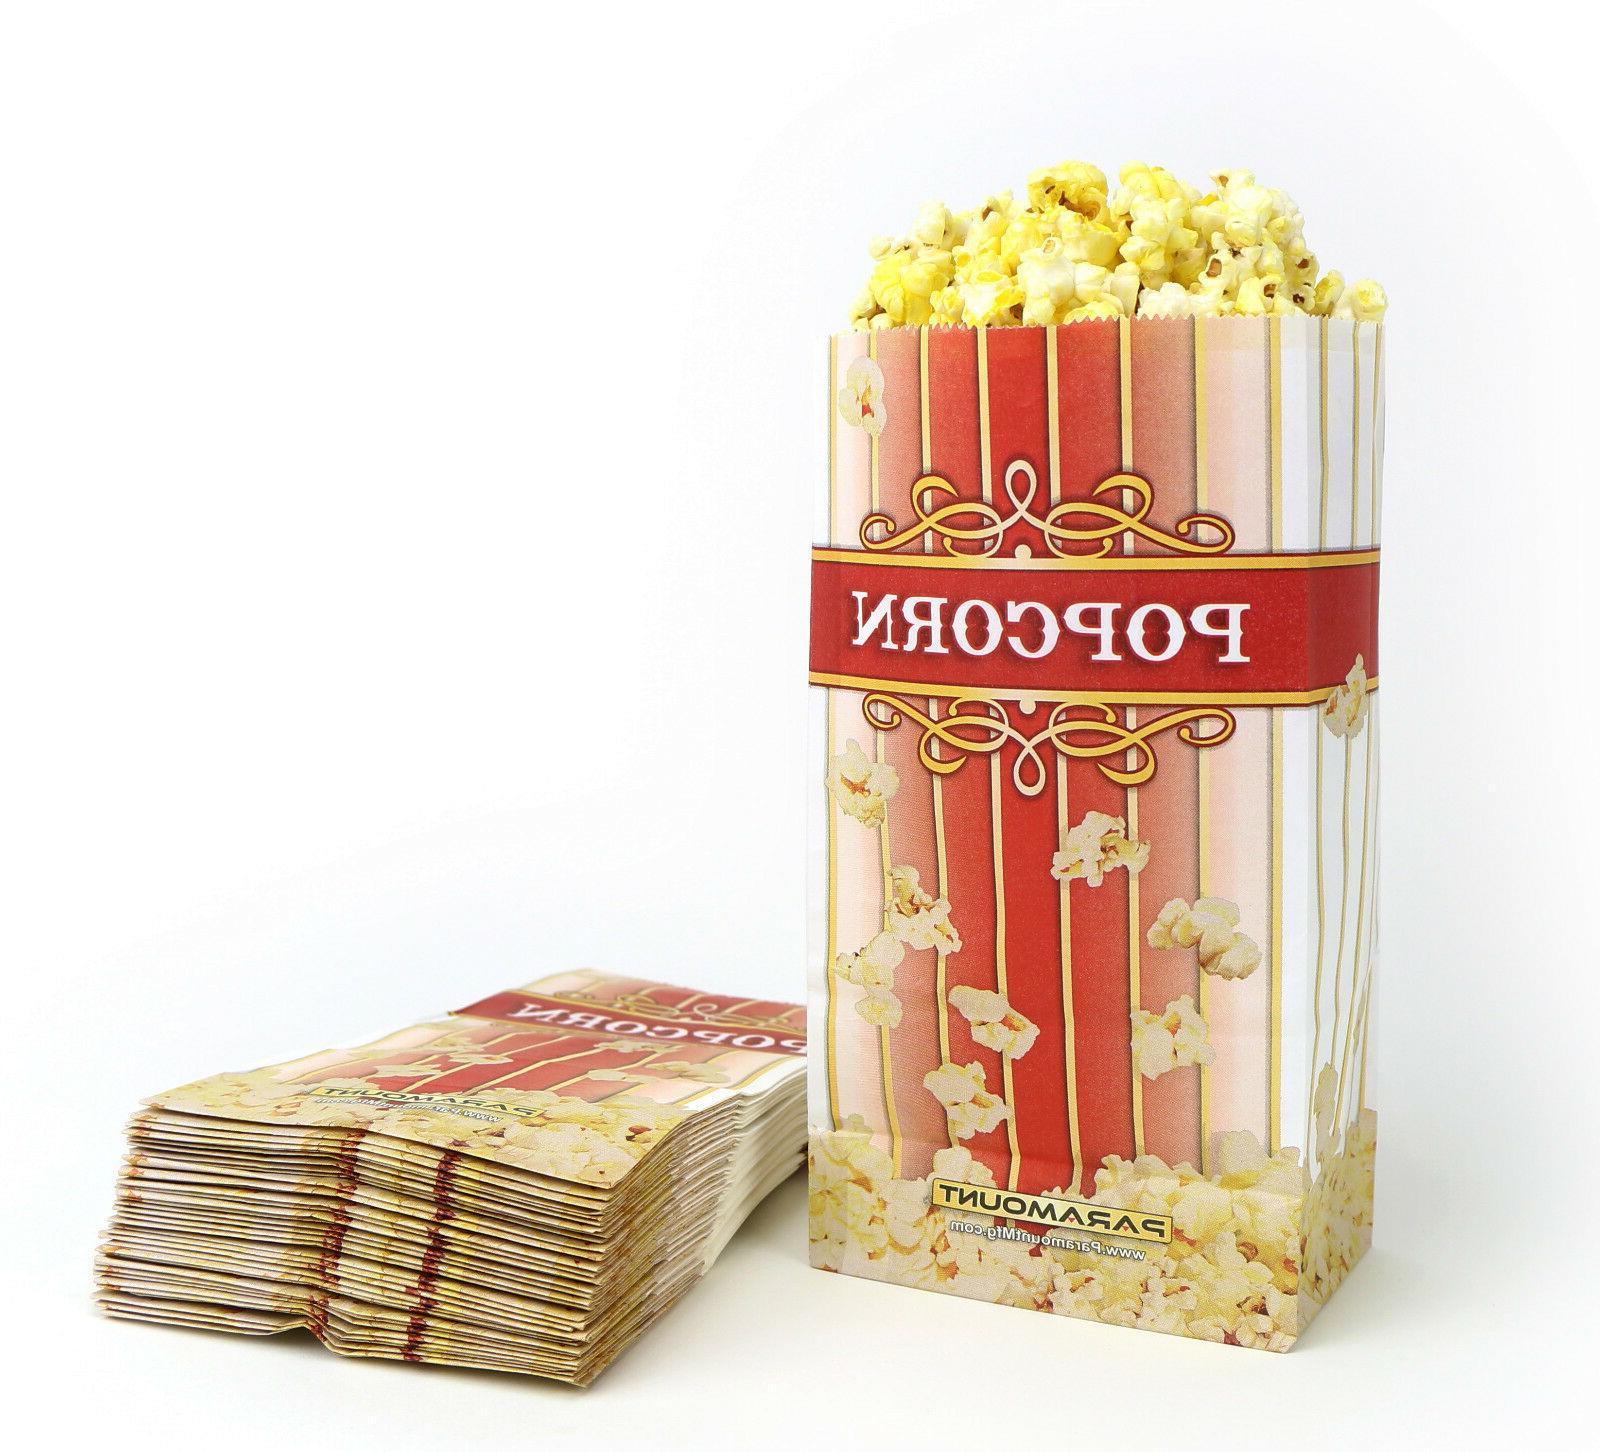 100 popcorn serving bags